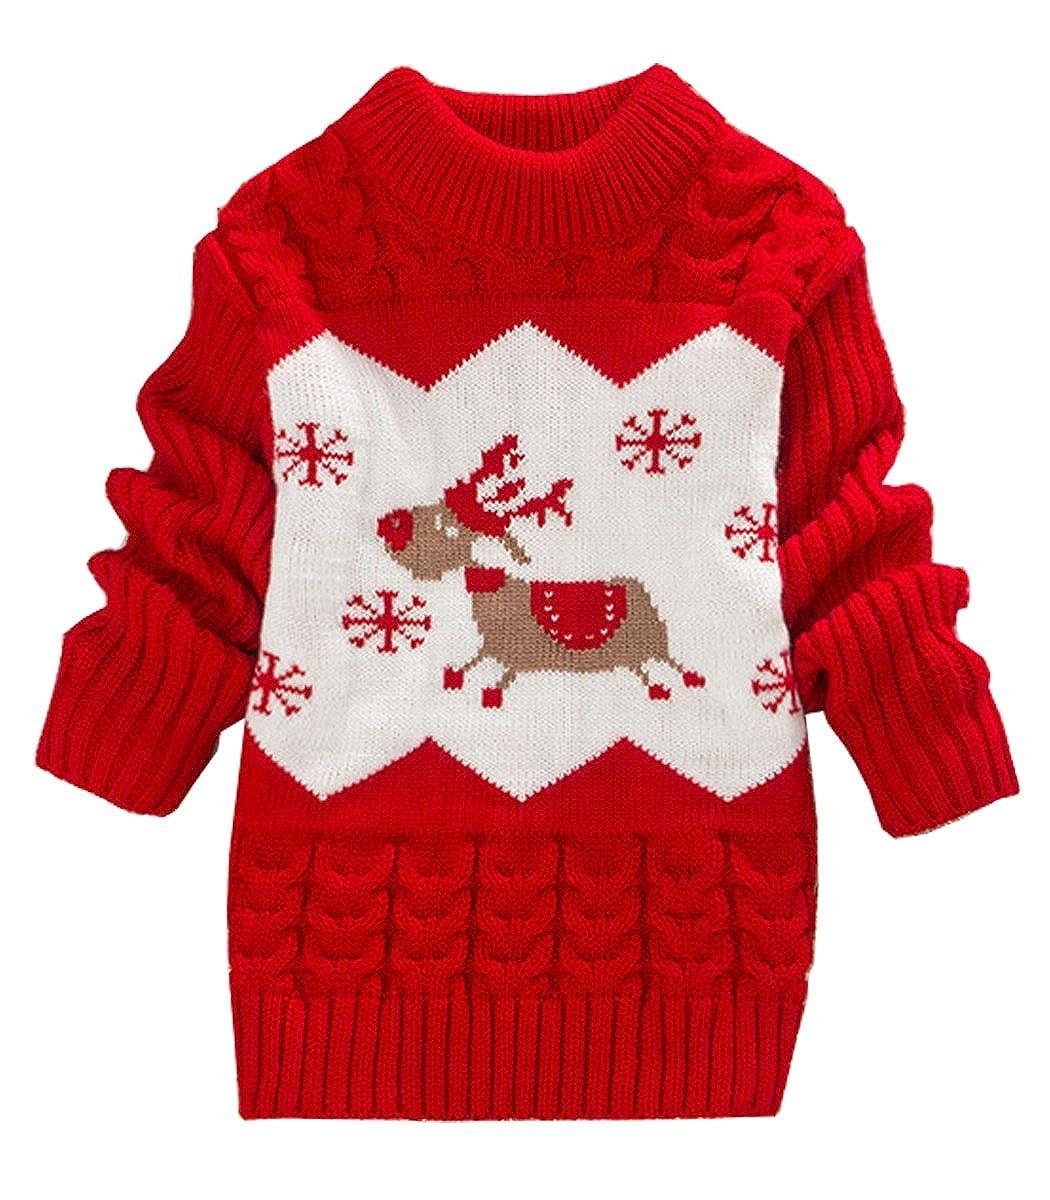 Zhuannian Baby Toddler Boy Knitted Cartoon Reindeer Christmas Pullover Sweater